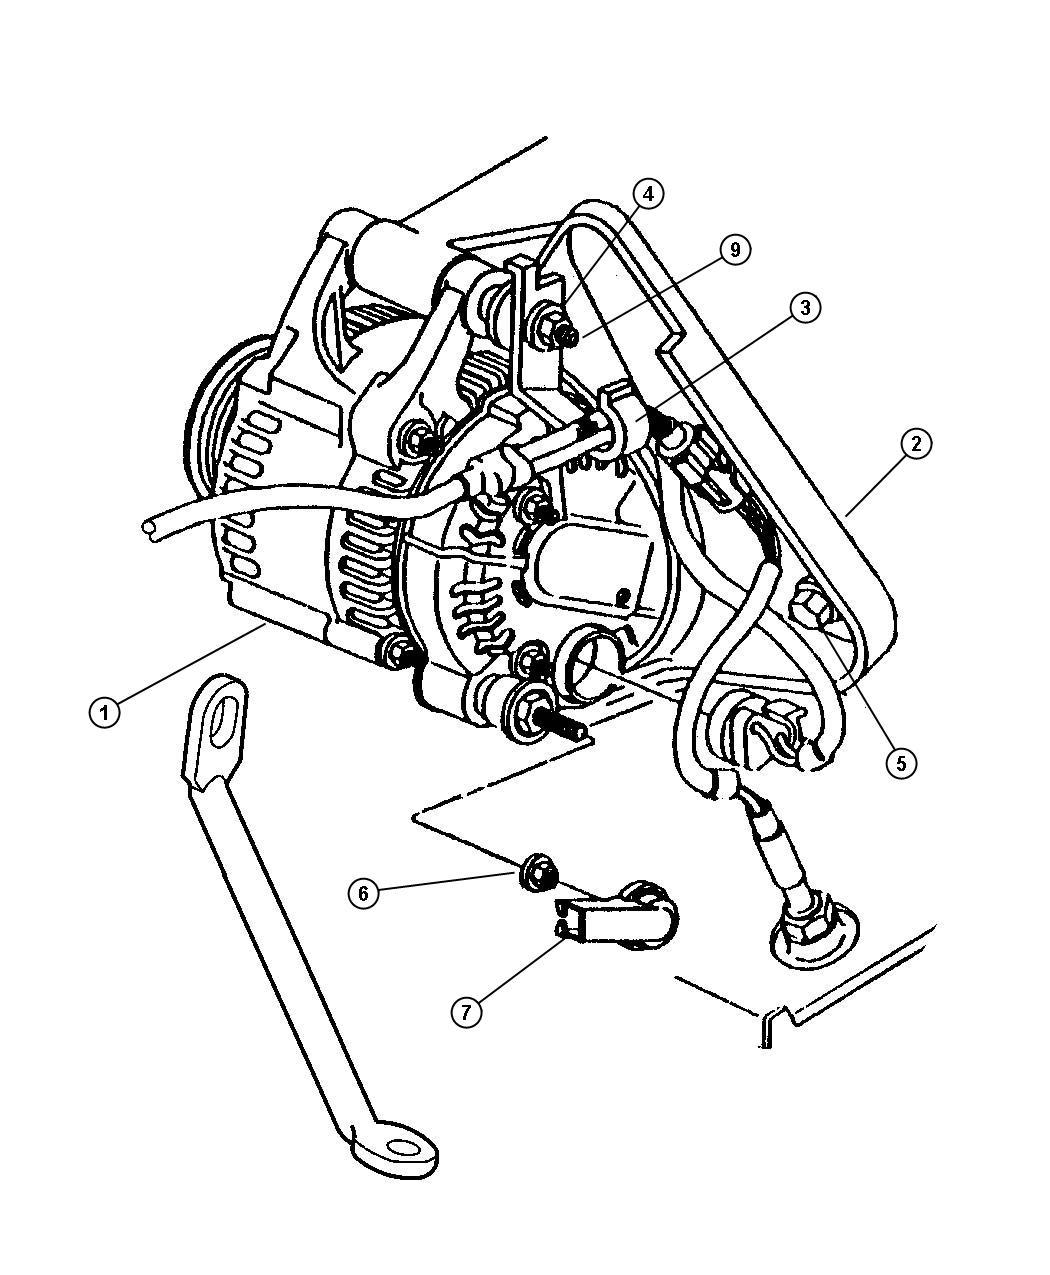 Jeep Wrangler Nut Hex Flange Lock M6x1 A C Line